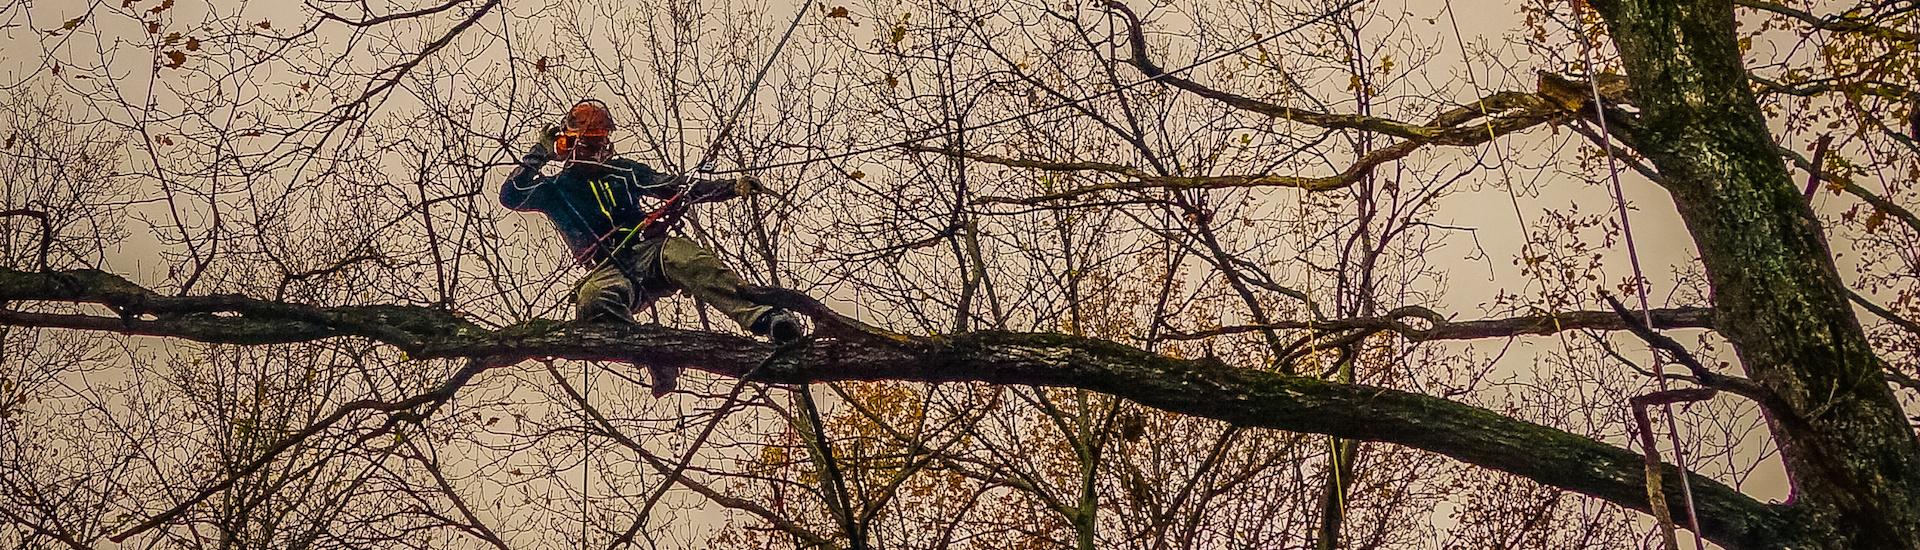 Снимка на арборист на дърво